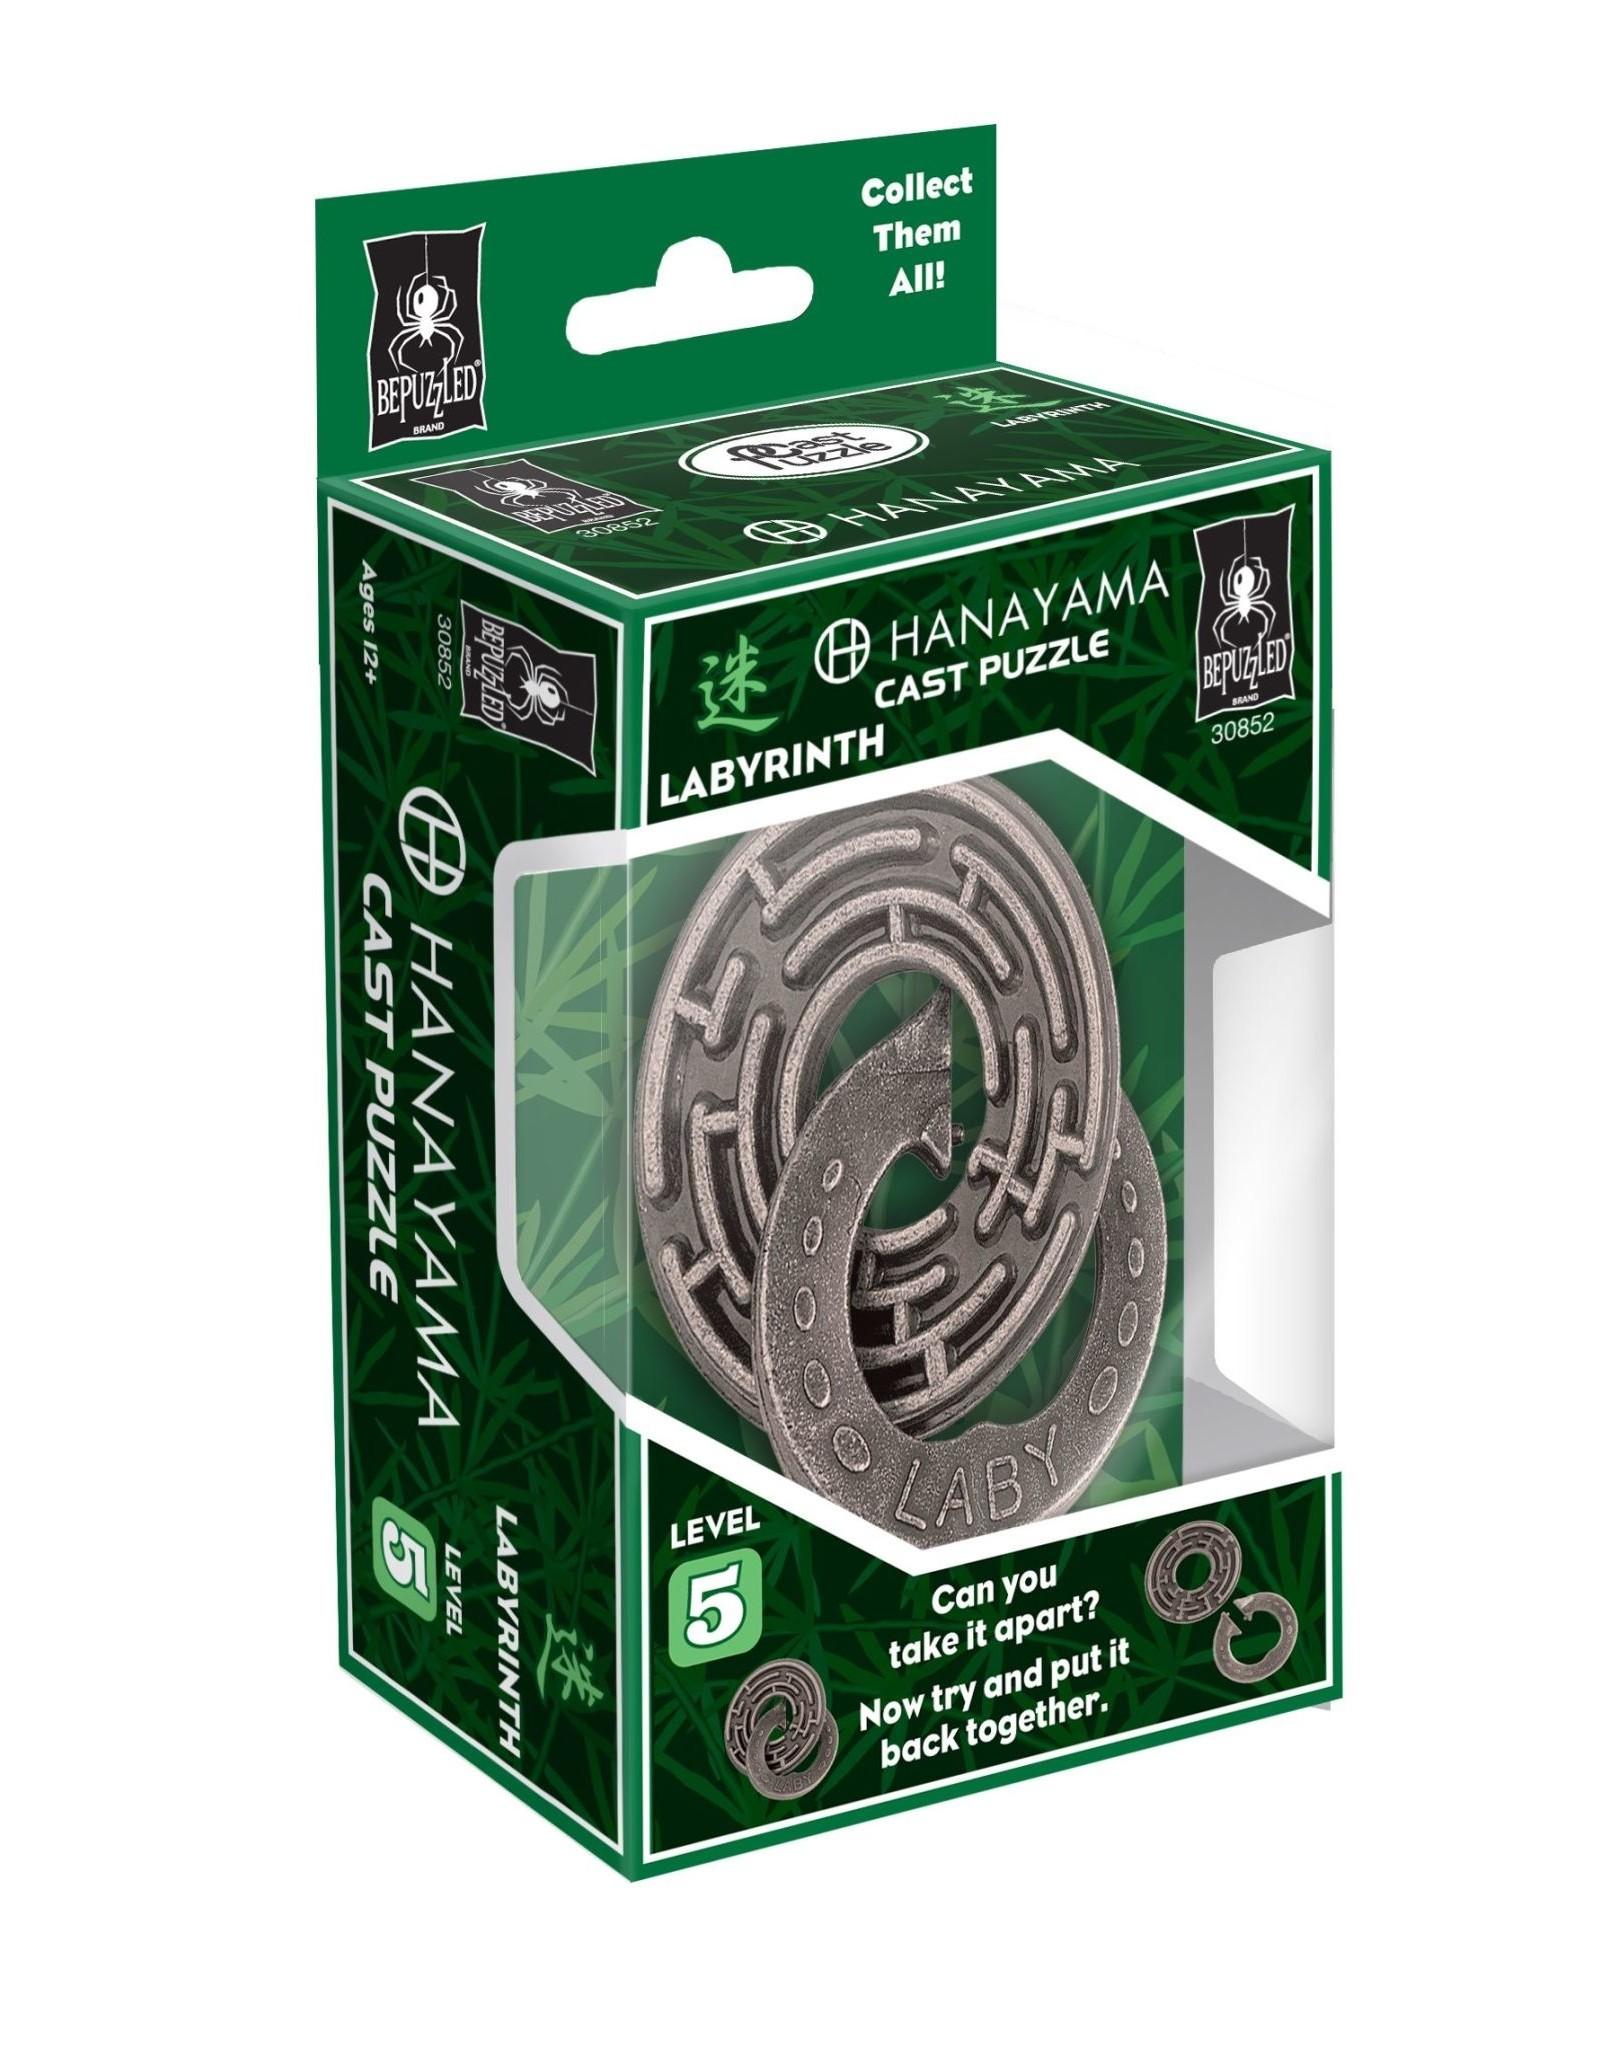 Hanayama Lvl 5 Labyrinth